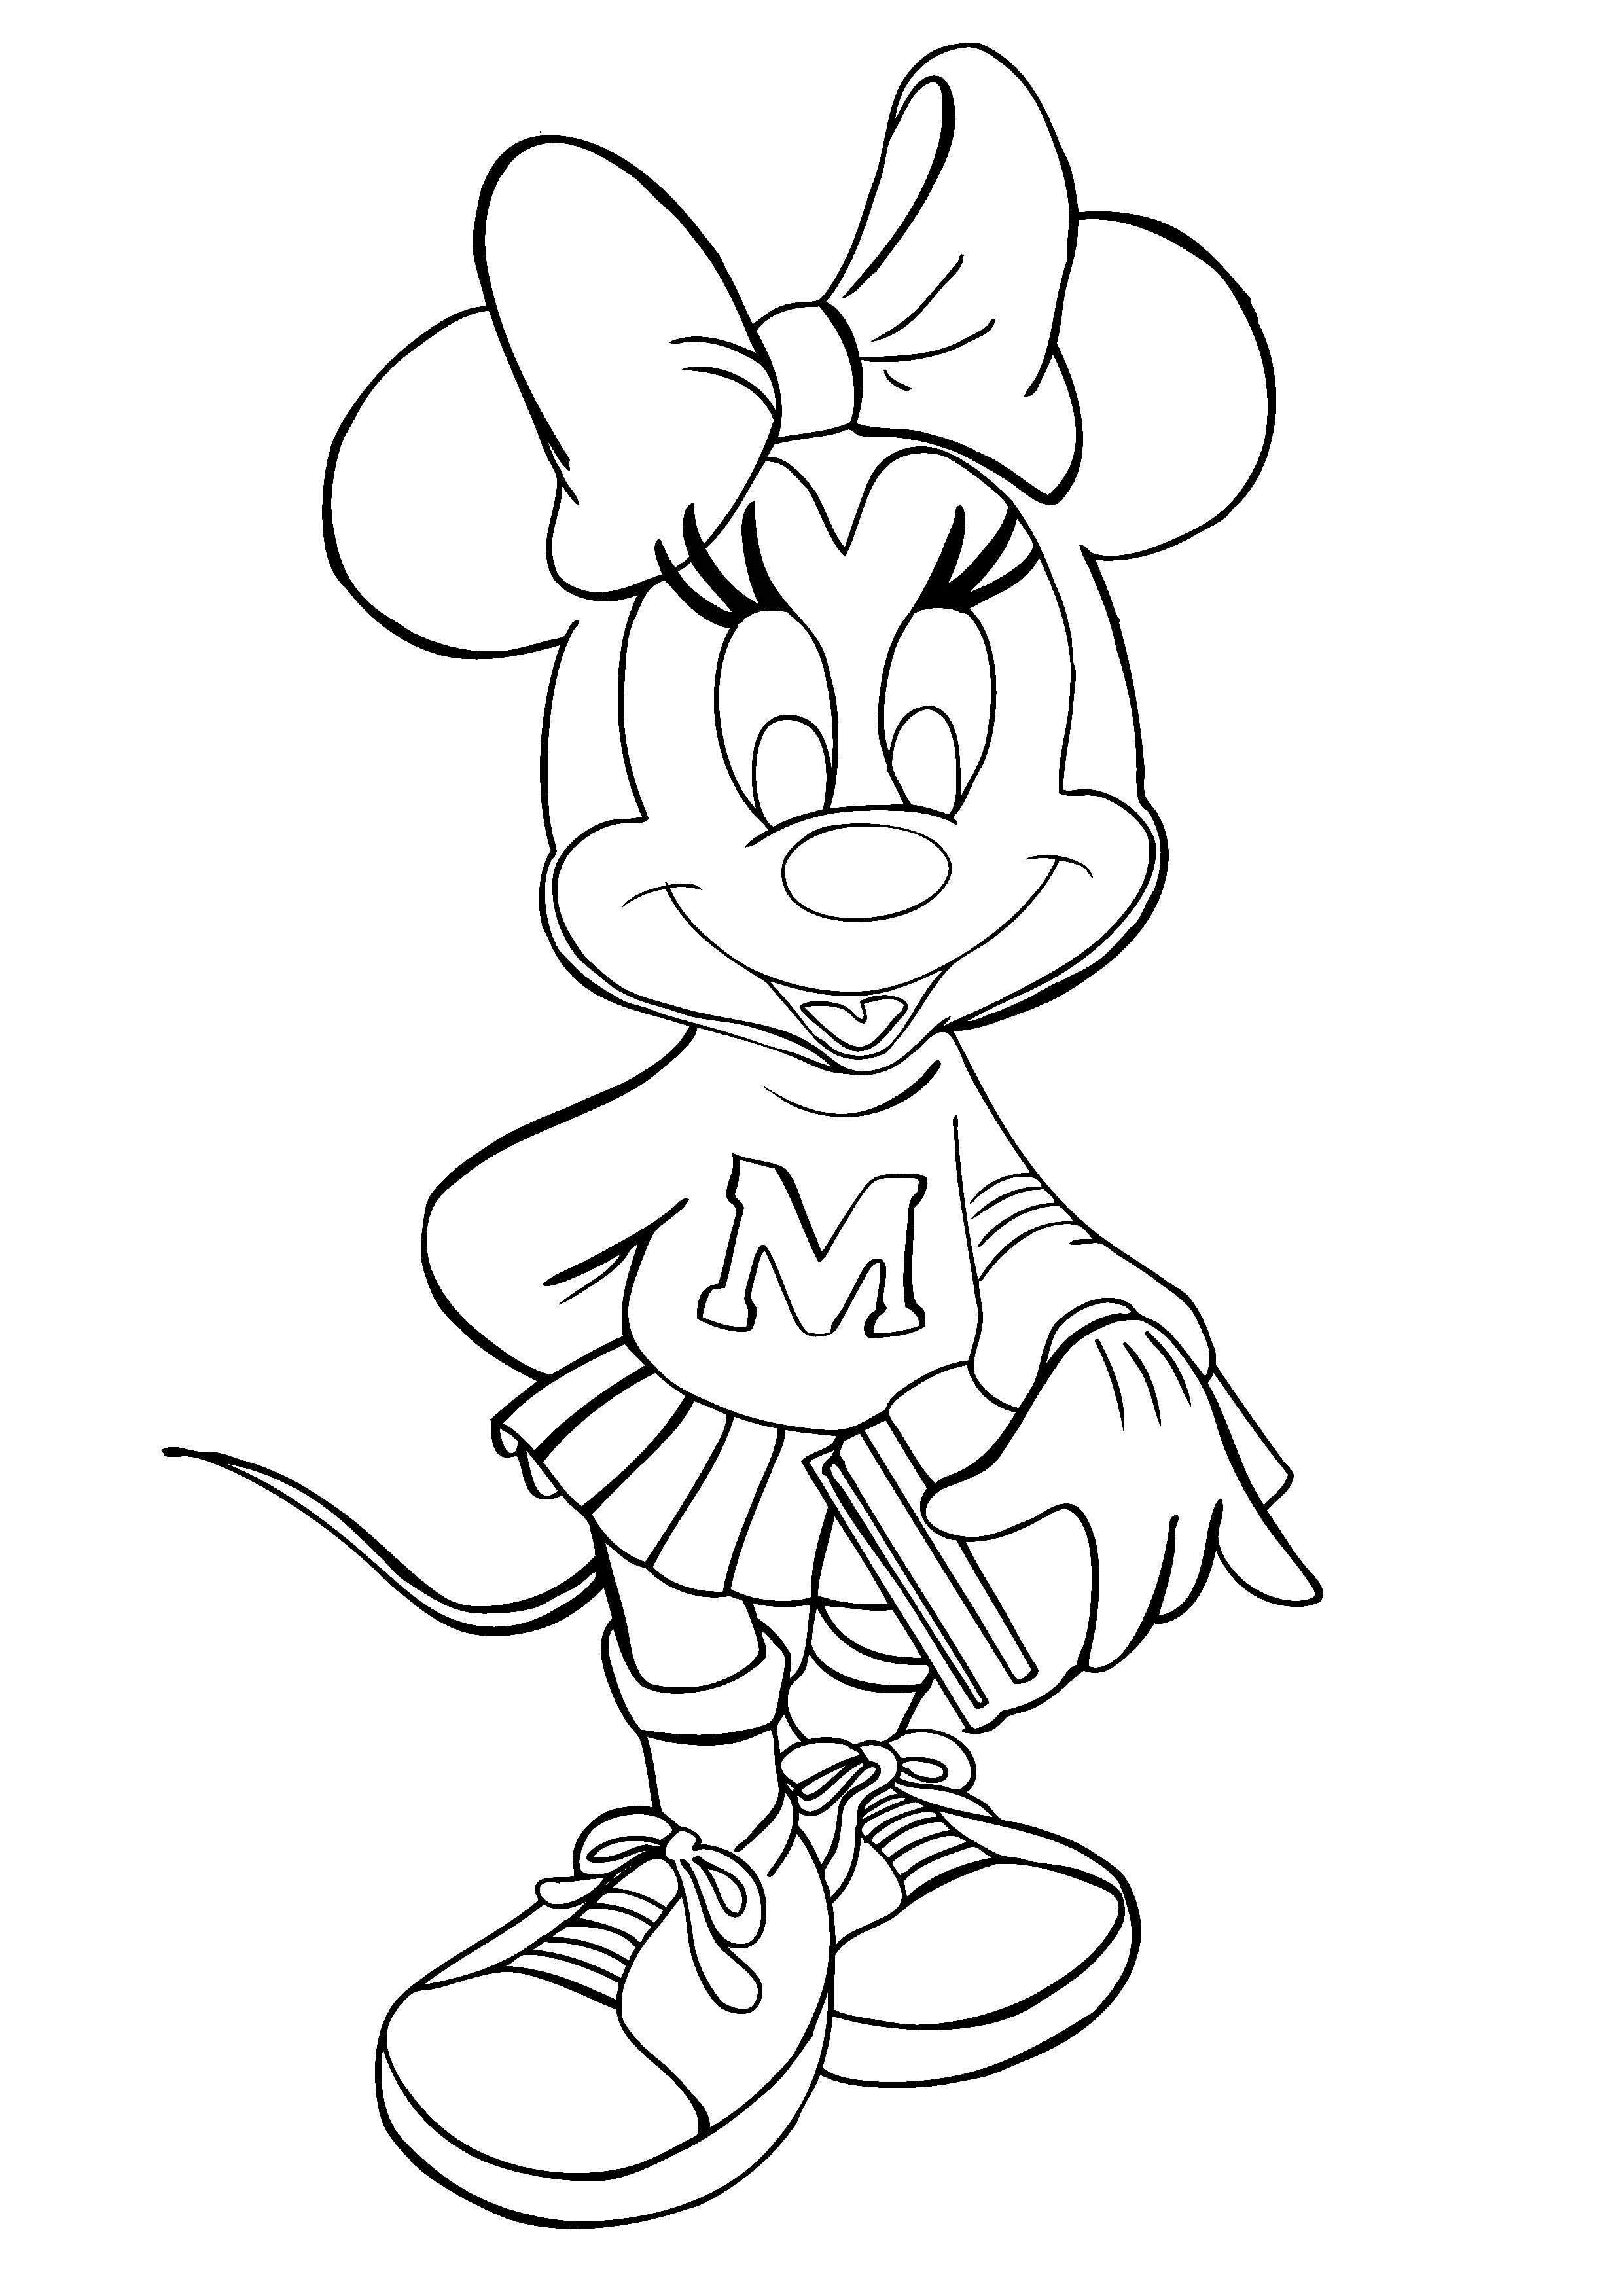 Minnie Mouse Para Colorear 𝐃𝐢𝐛𝐮𝐣𝐨𝐬 𝐩𝐚𝐫𝐚